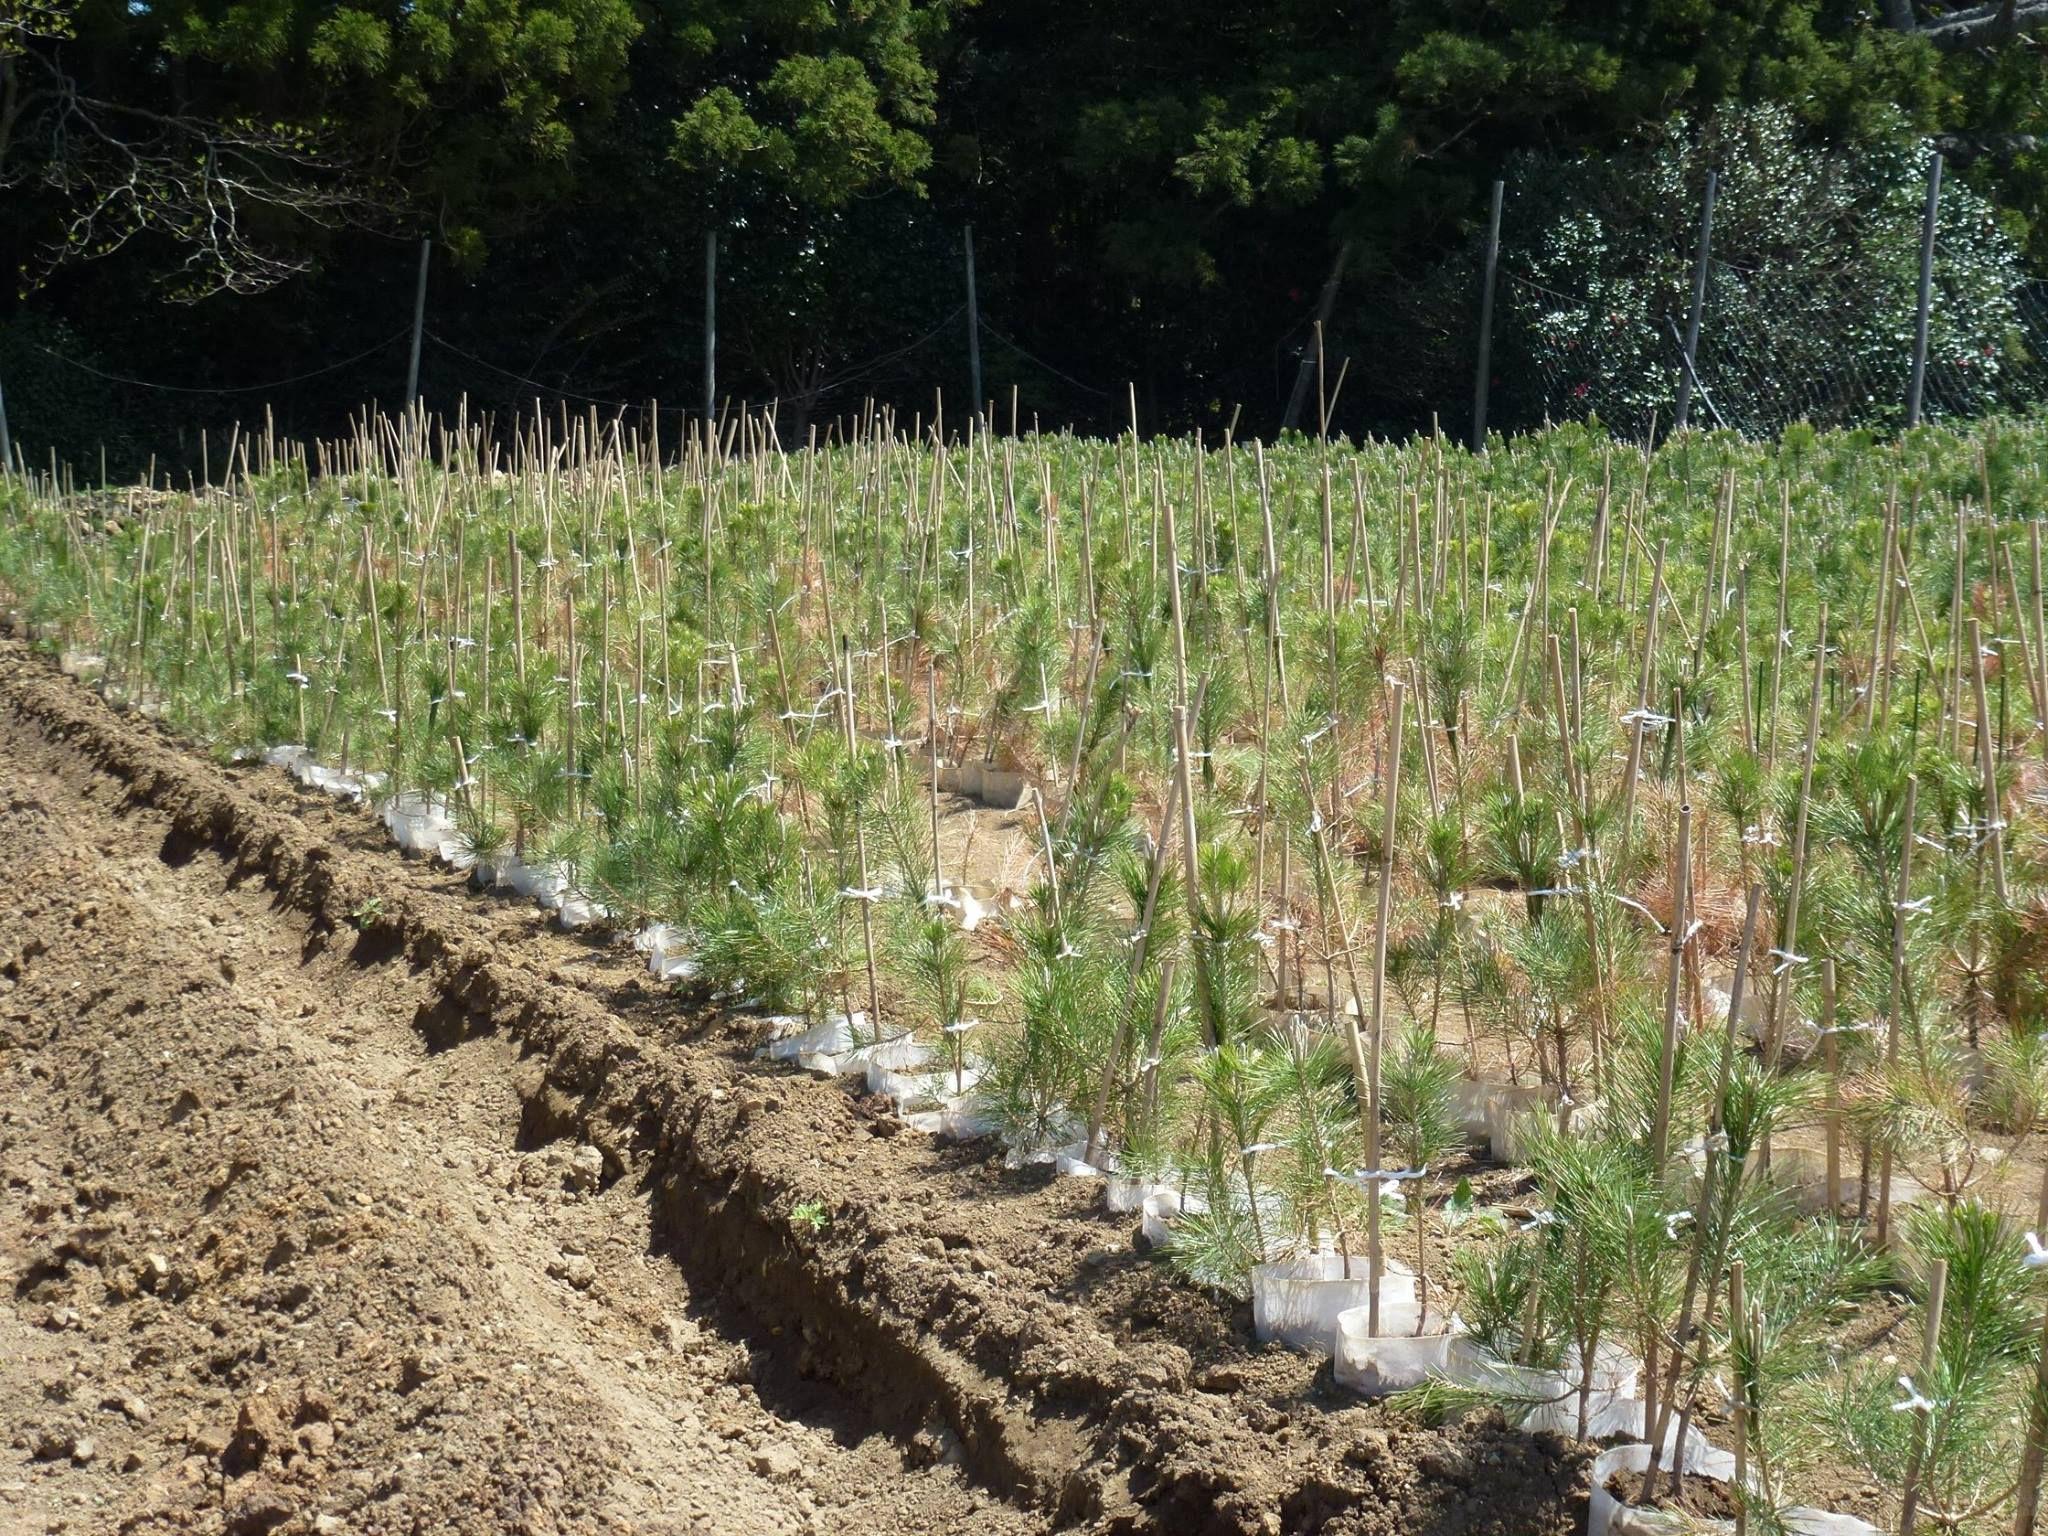 Pine tree saplings in the reclamation of Rikuzentakata, Japan